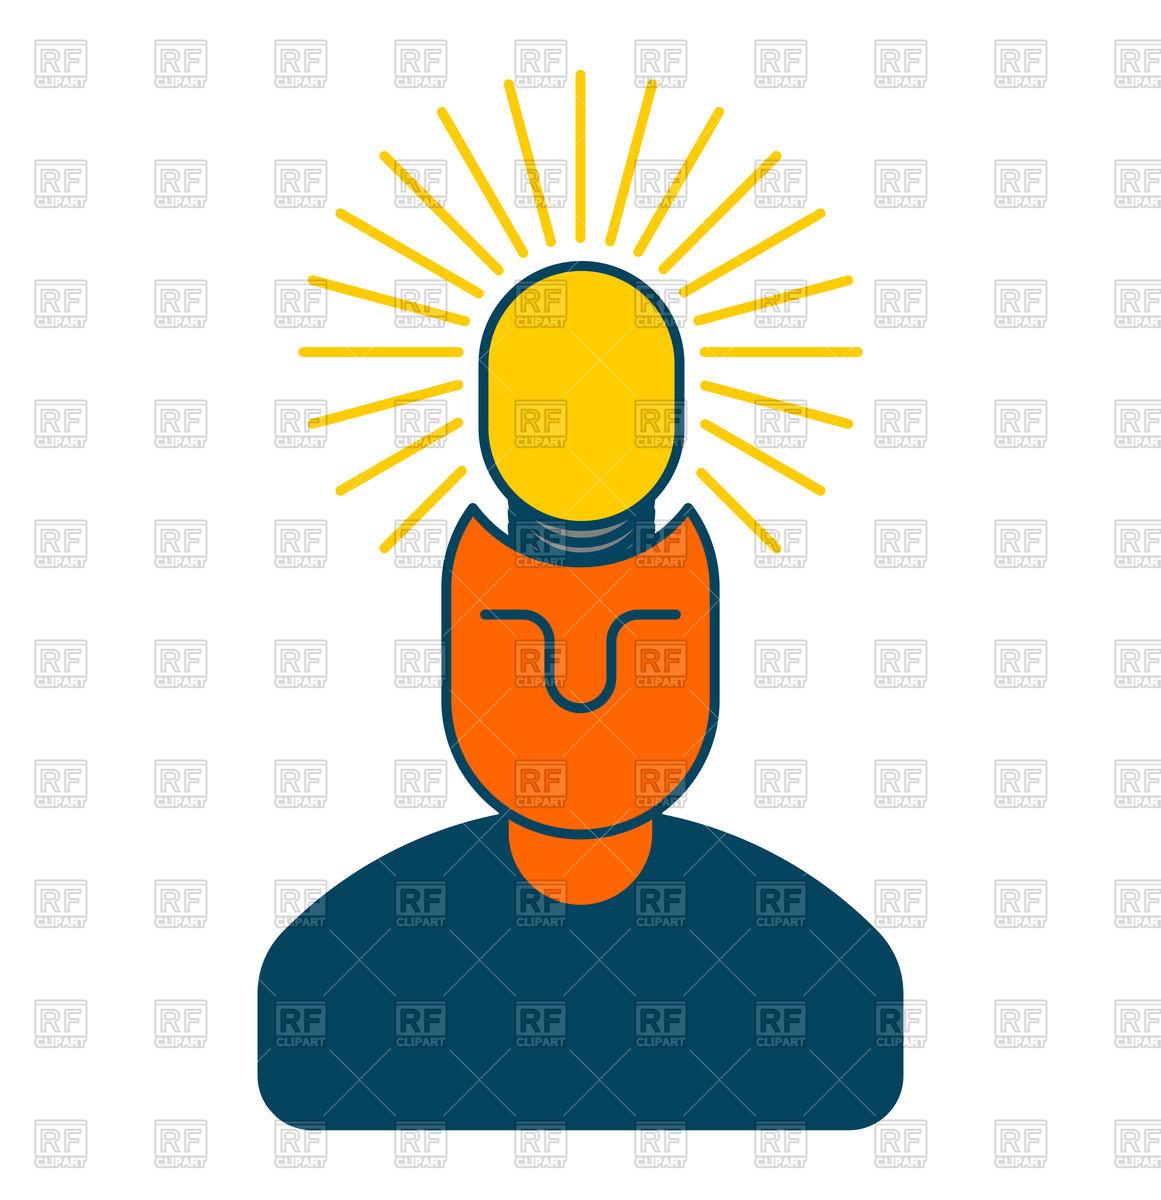 1161x1200 Creative Idea. Smart Man With Light Bulb In Head. Royalty Free